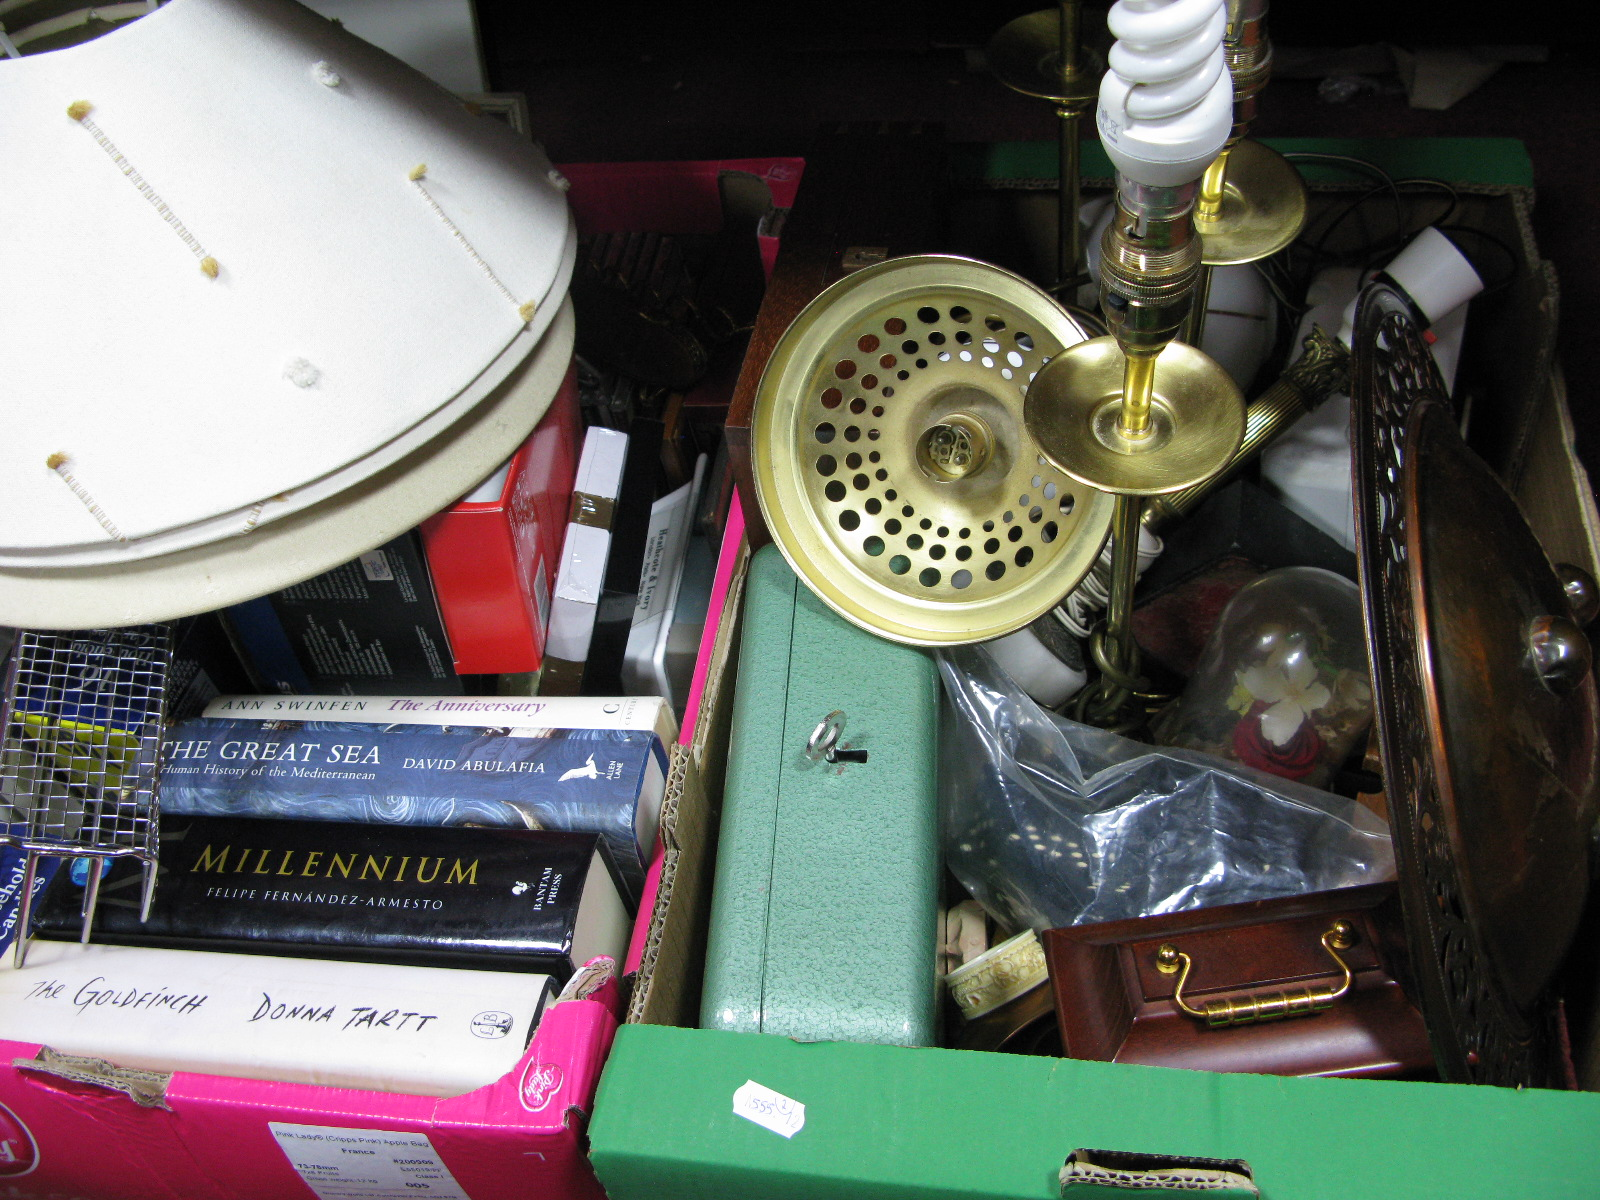 Lot 1031 - Pipe Stand, quartz mantel clock, C.D's, photo frames, books, table lamps etc:- Two Boxes